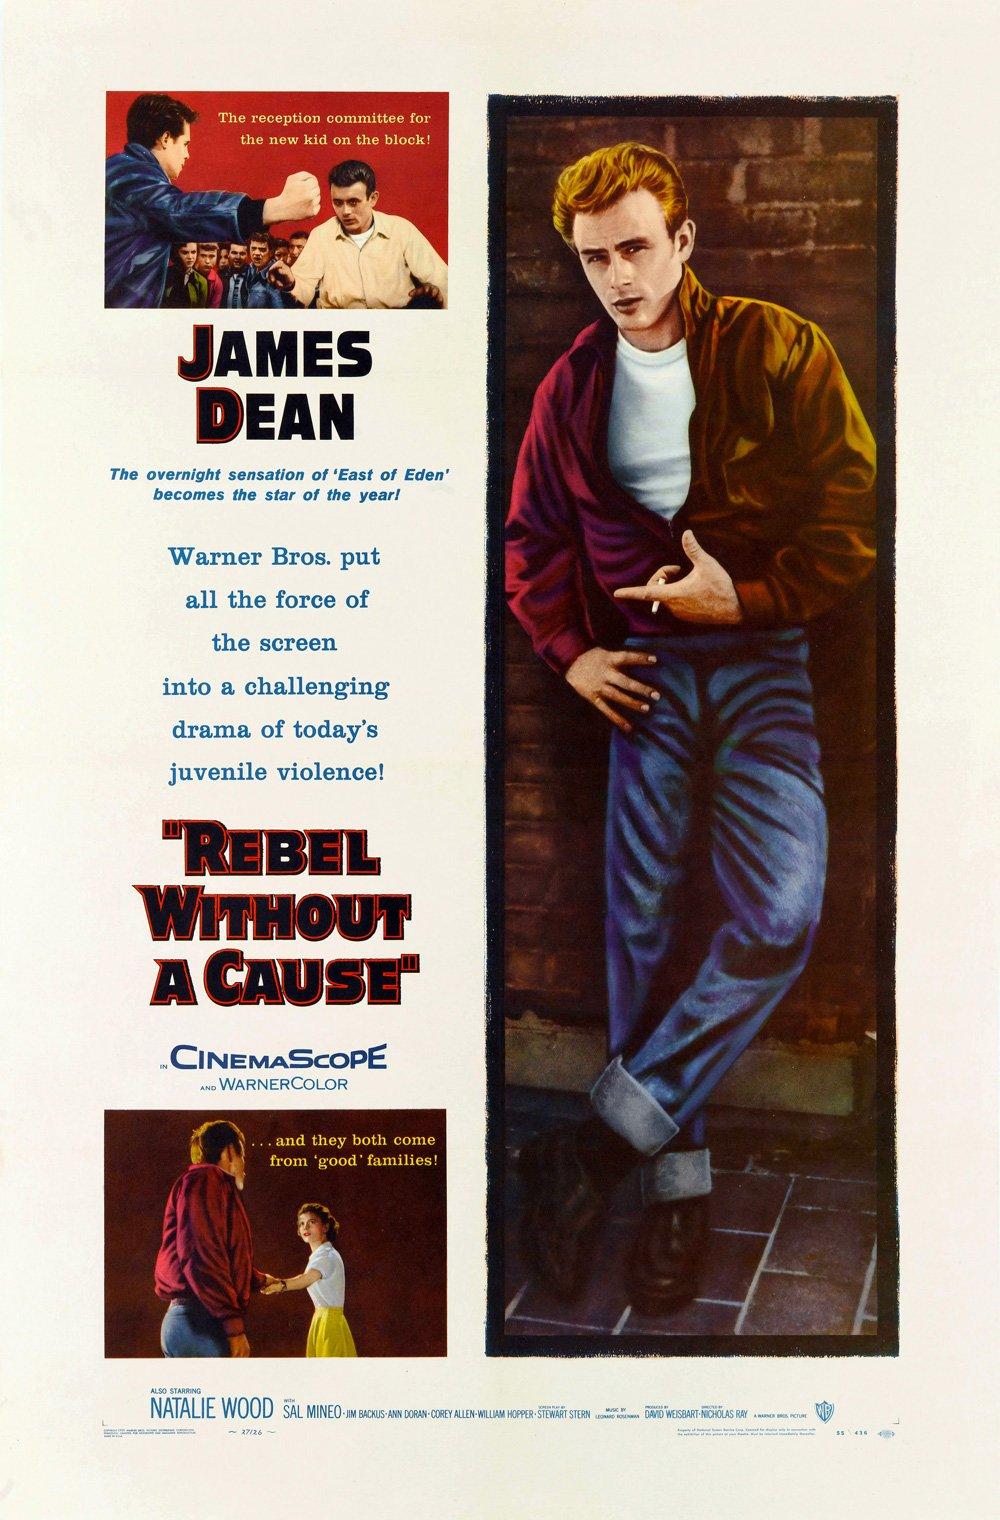 James Dean Movie Posters on Canvas AU